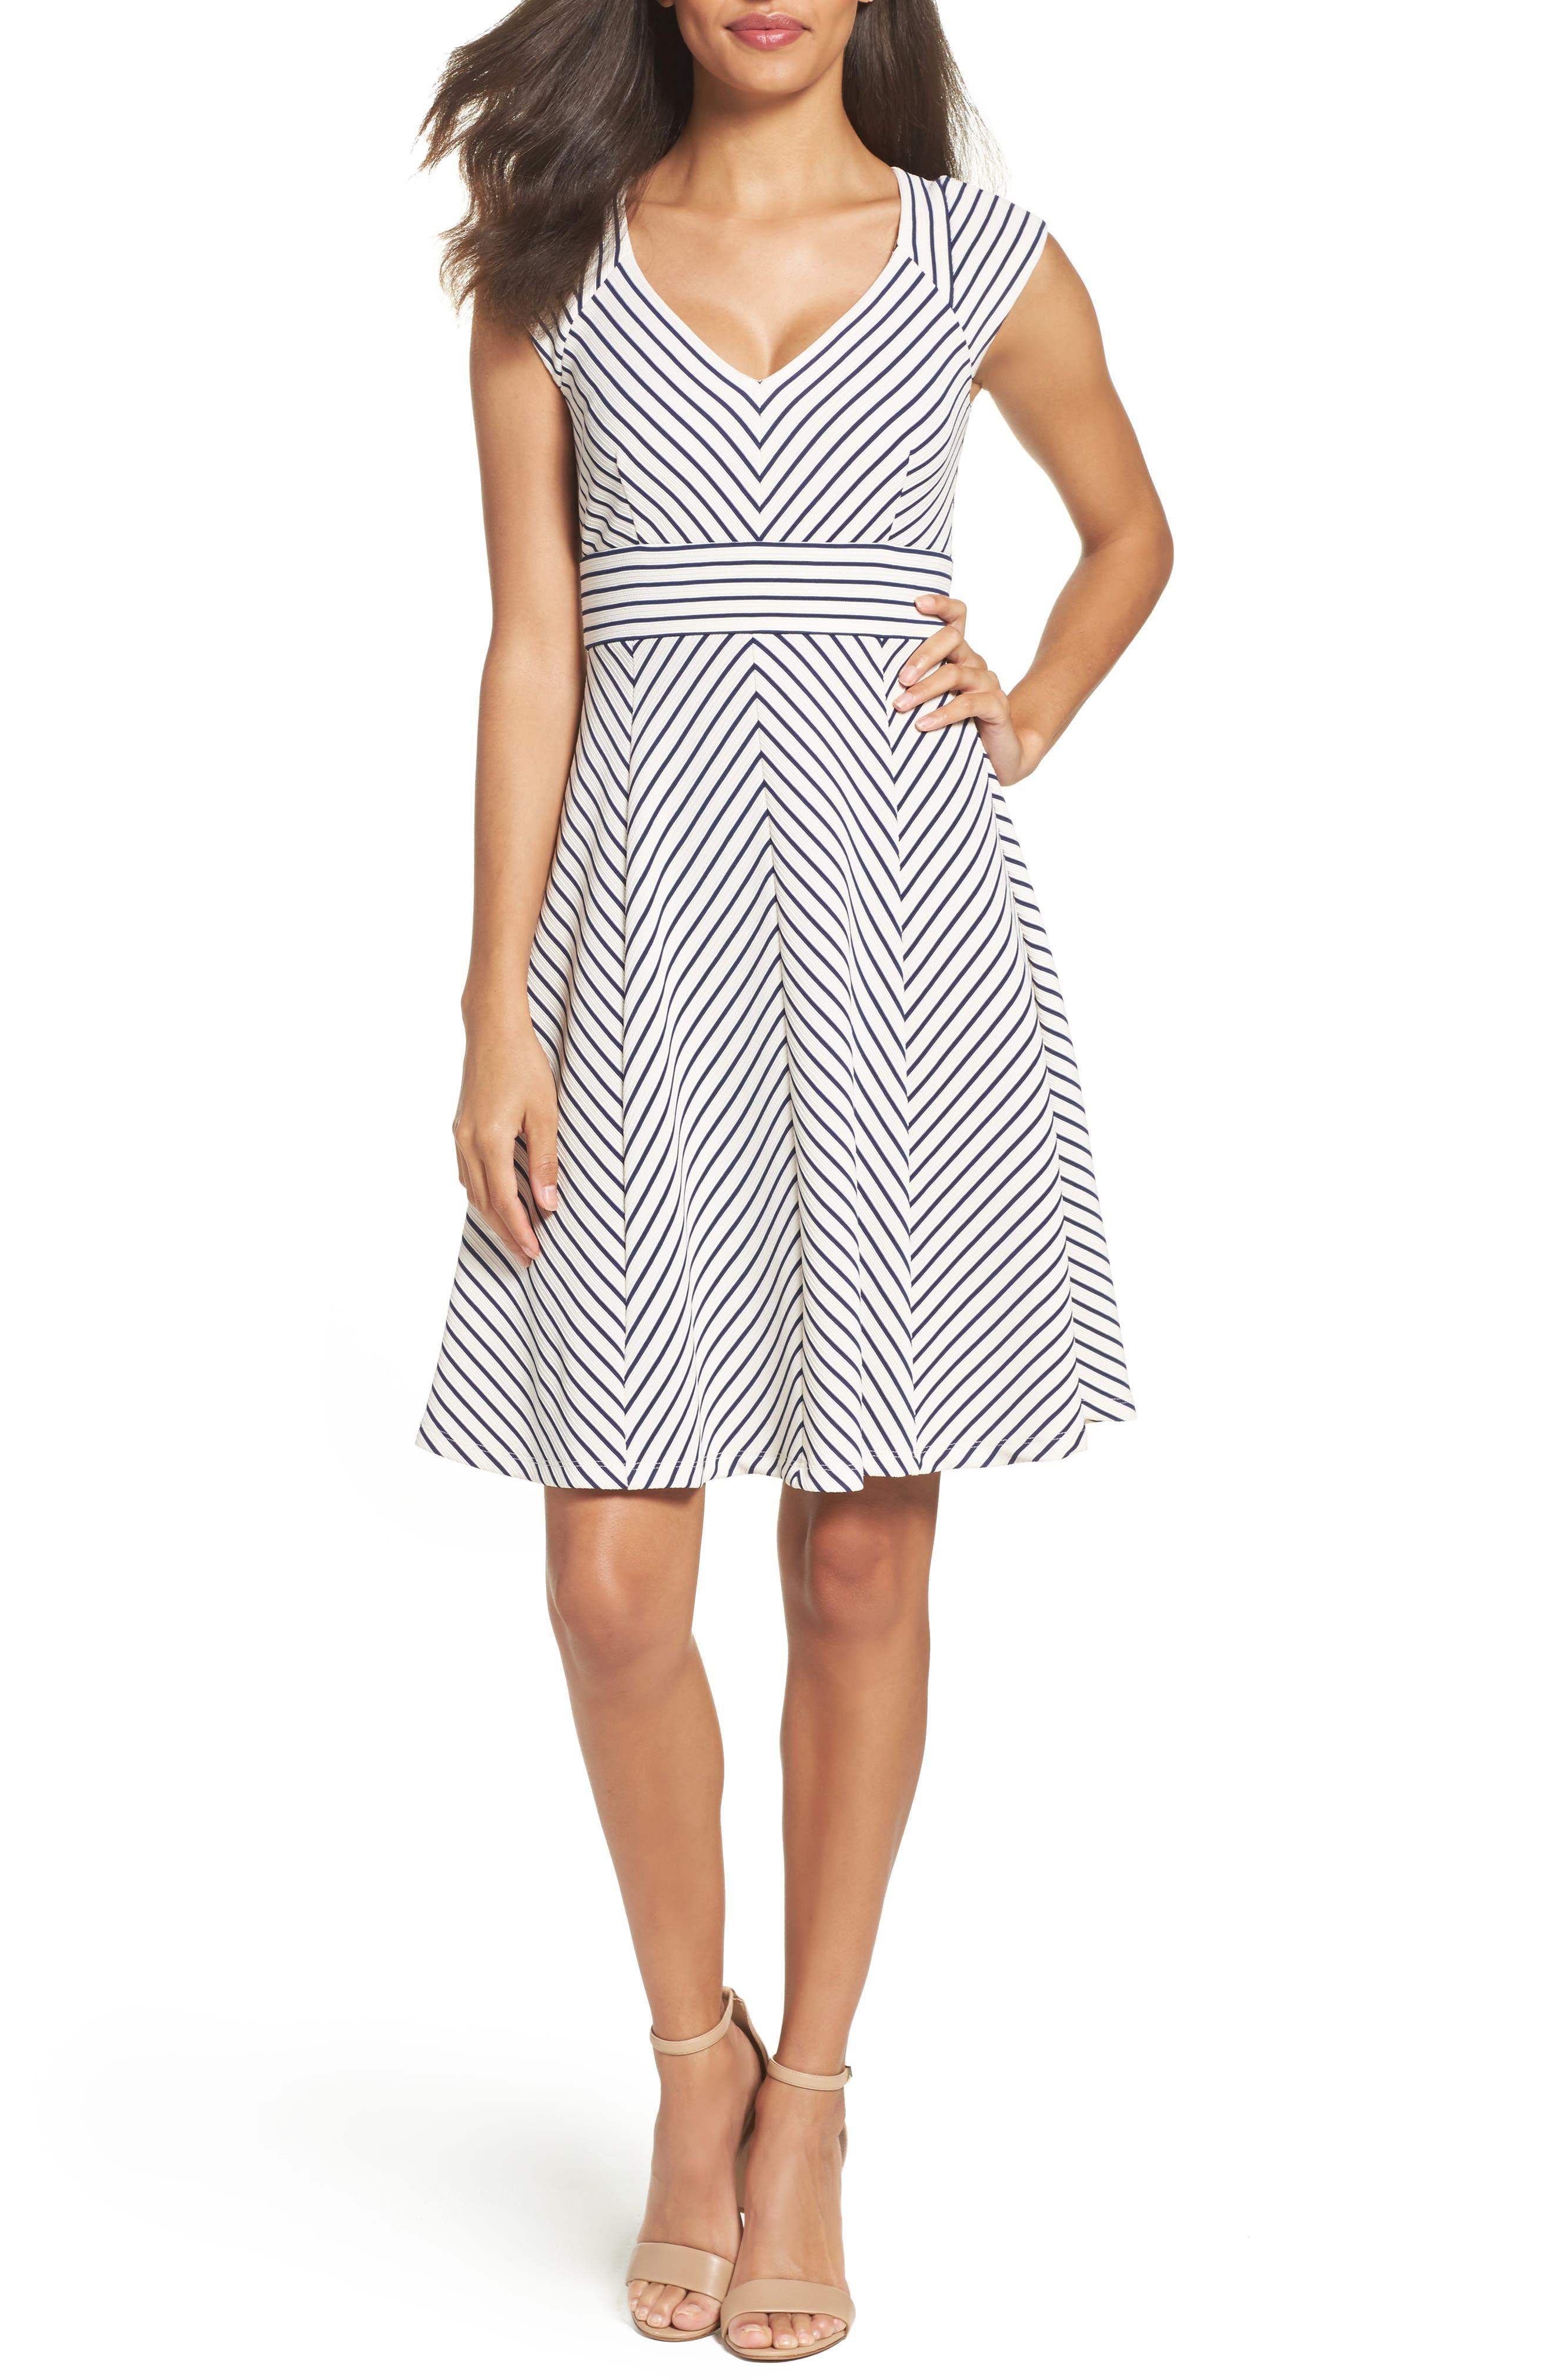 Alternate Image 1 Selected - Adrianna Papell Stripe Fit & Flare Dress (Regular & Petite)